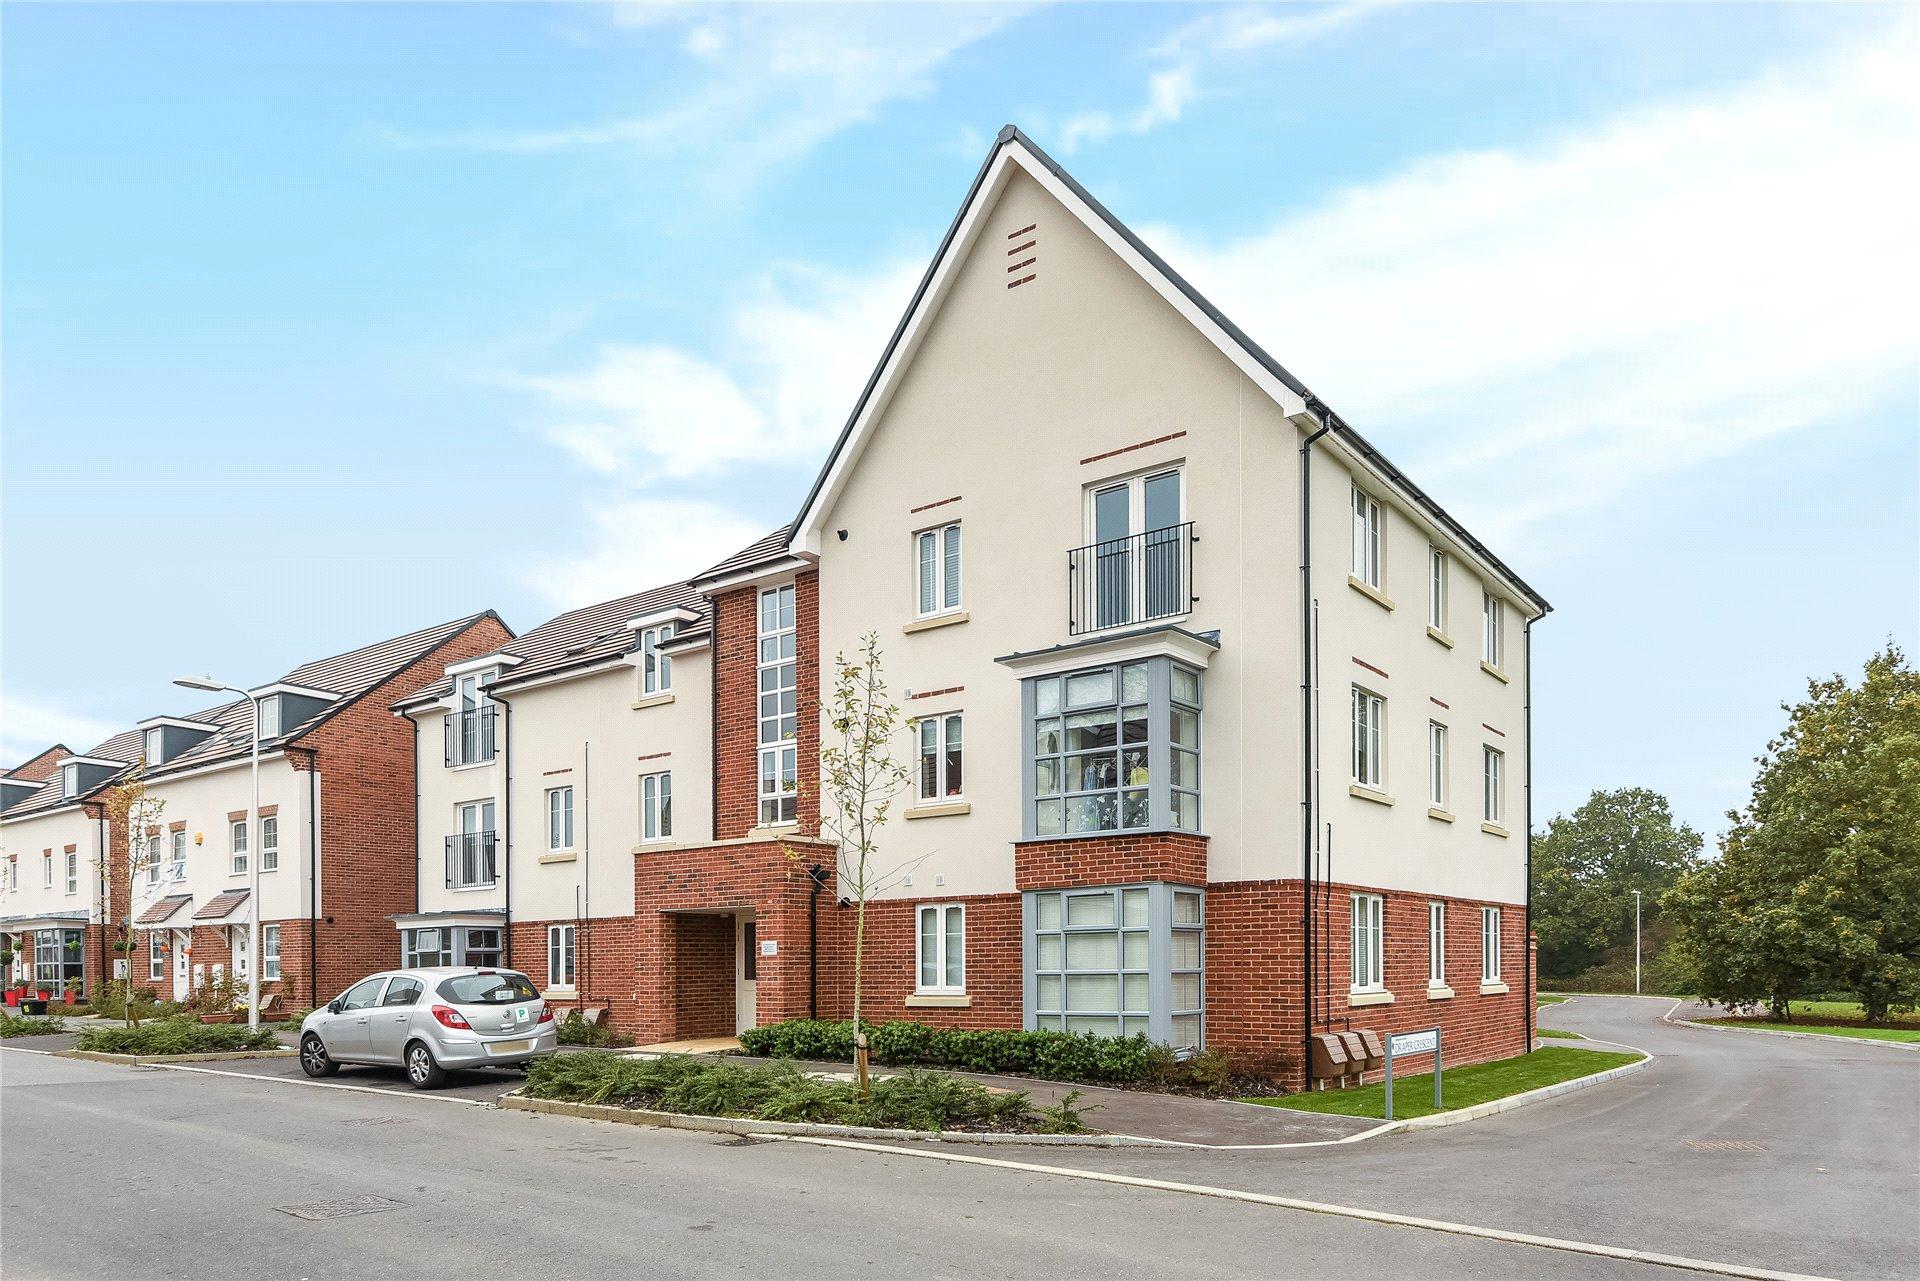 2 Bedrooms Apartment Flat for sale in Whitlock Avenue, Wokingham, Berkshire, RG40